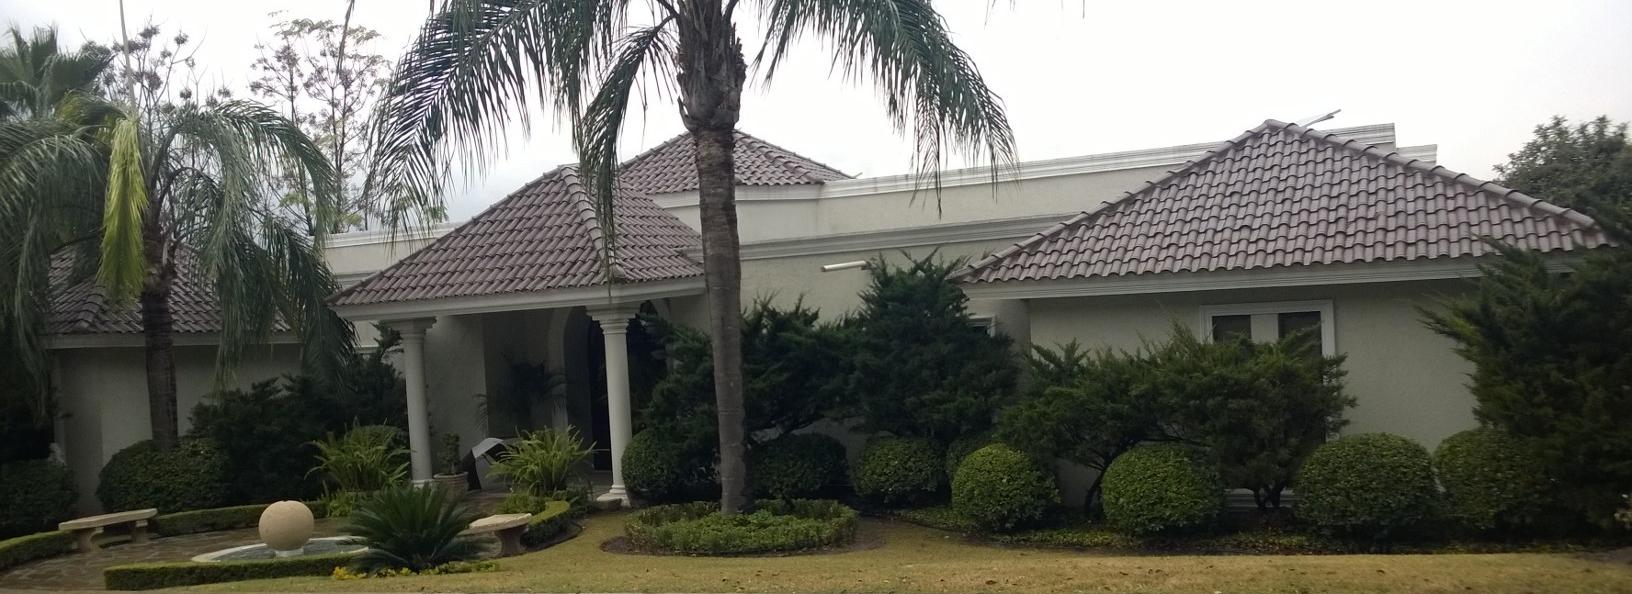 img13-fachada